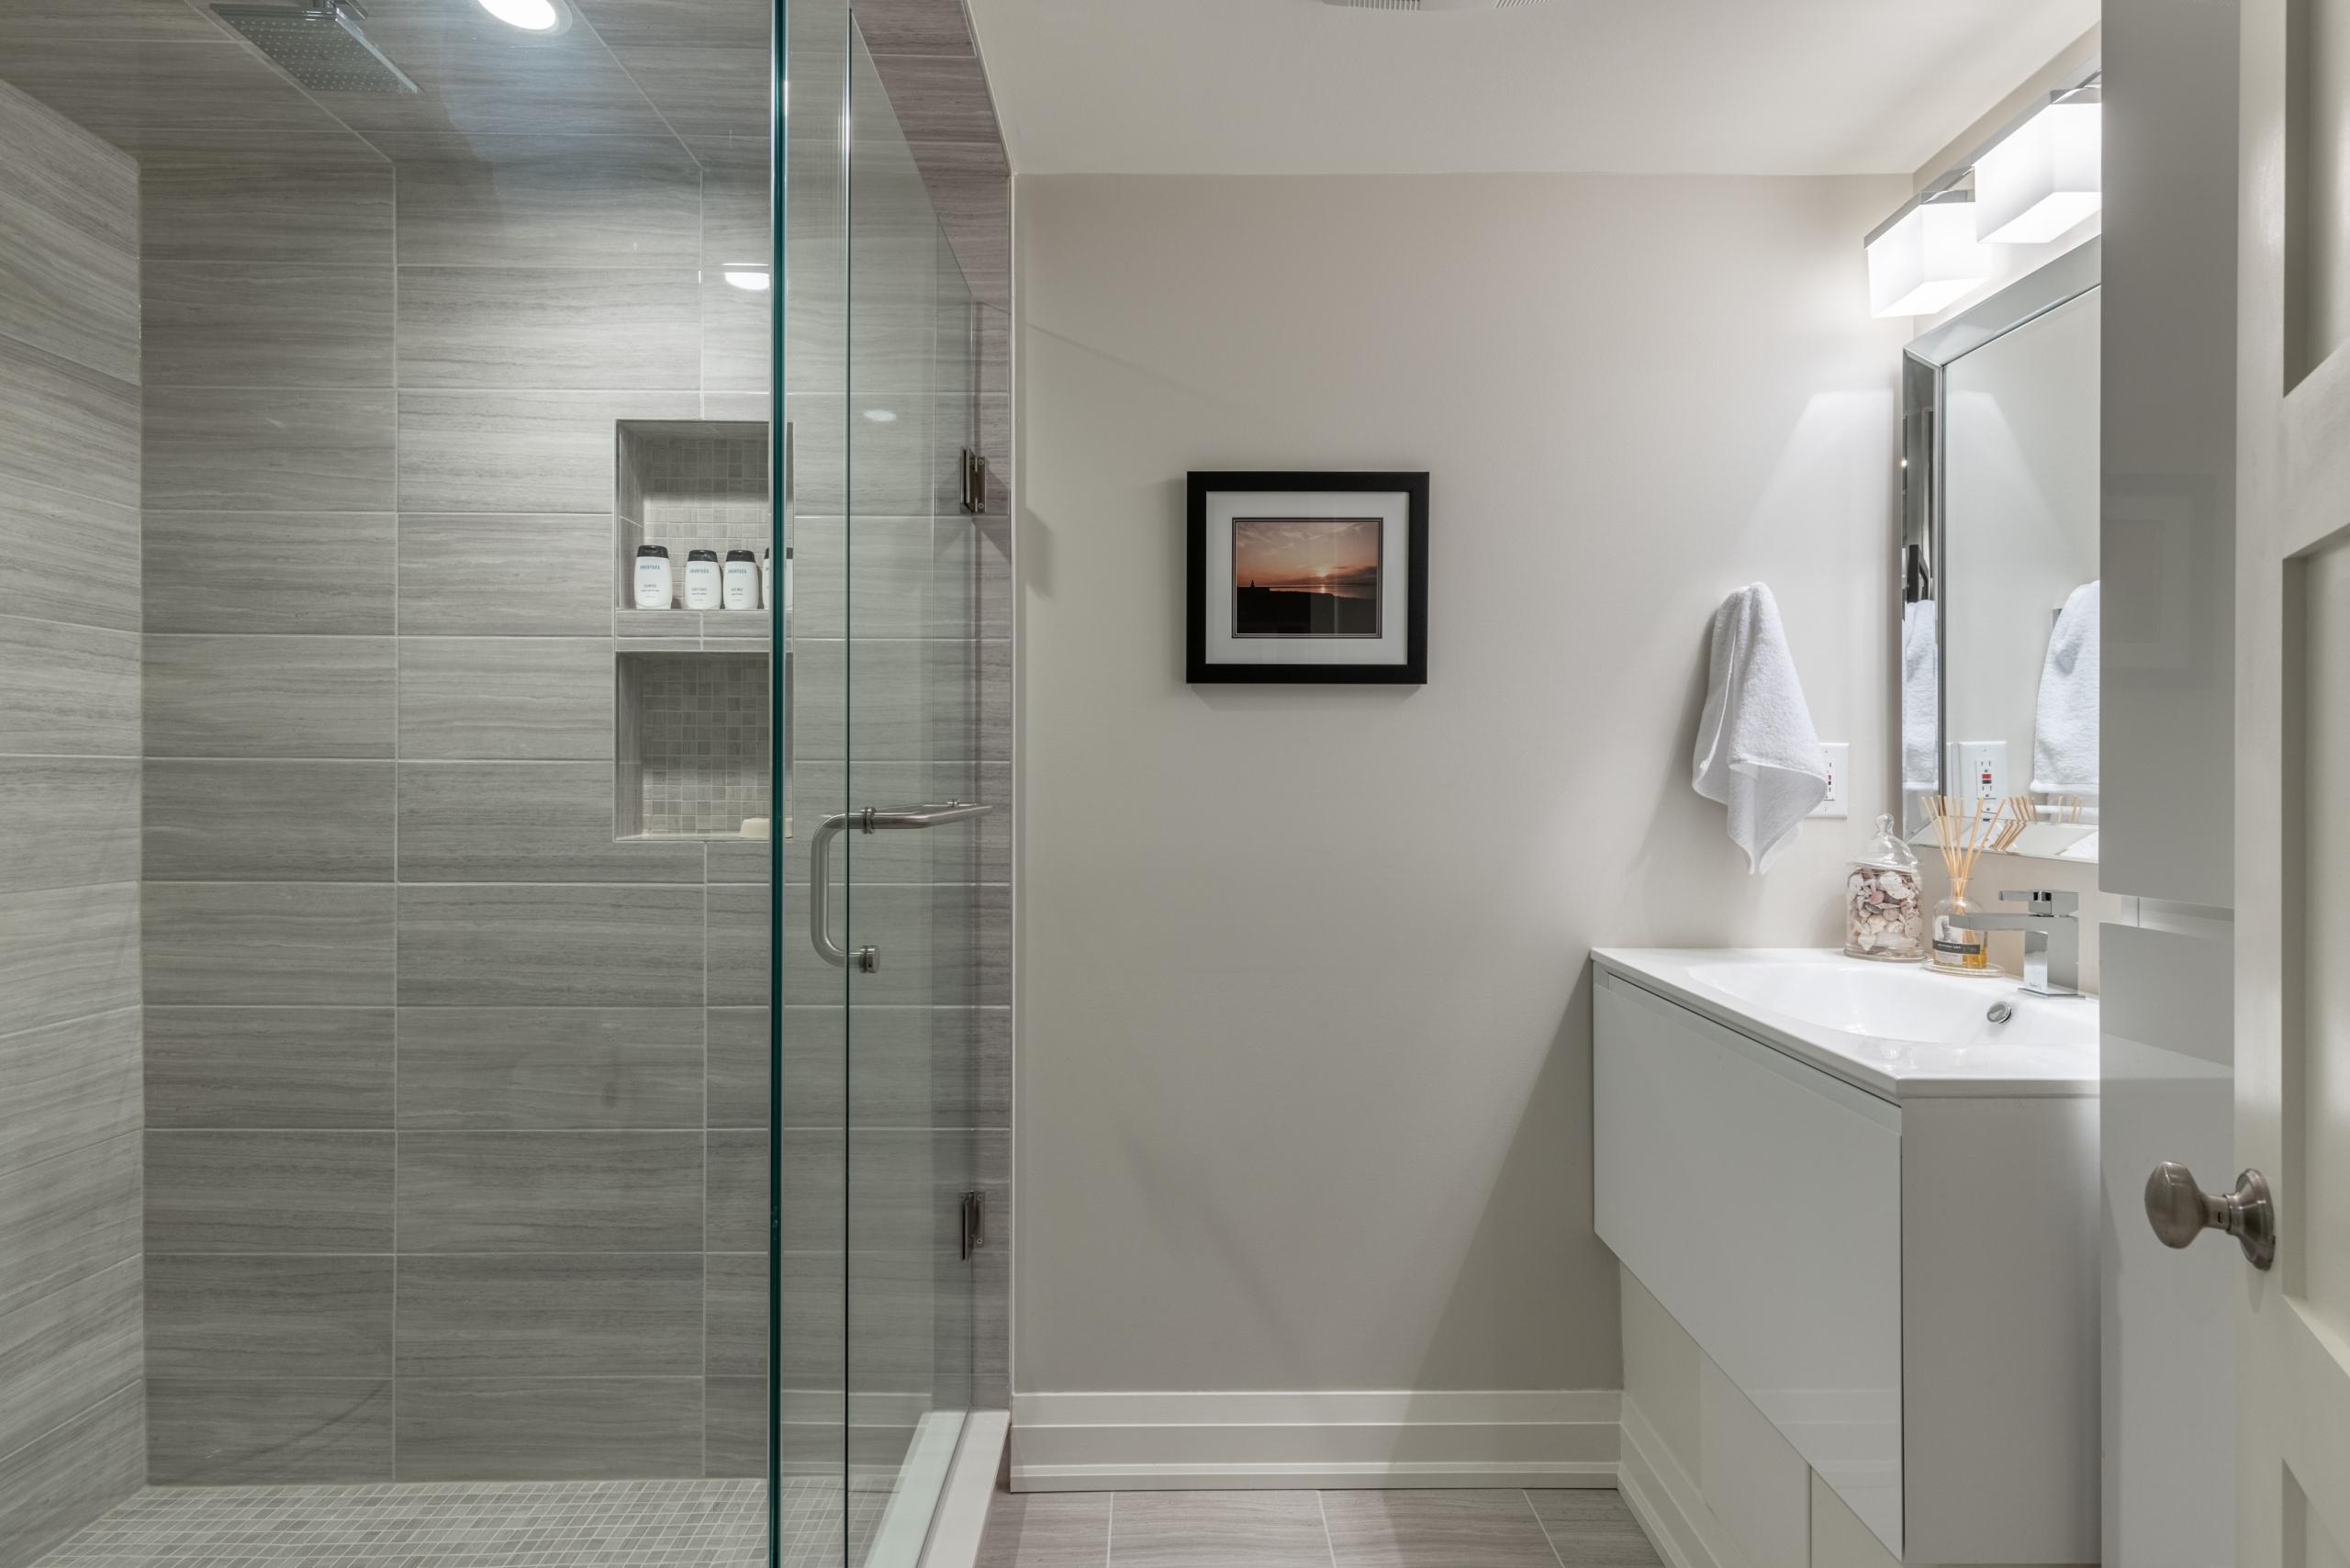 Bathroom featured at 1109 Morrison Heights Drive, Oakville at Alex Irish & Associates